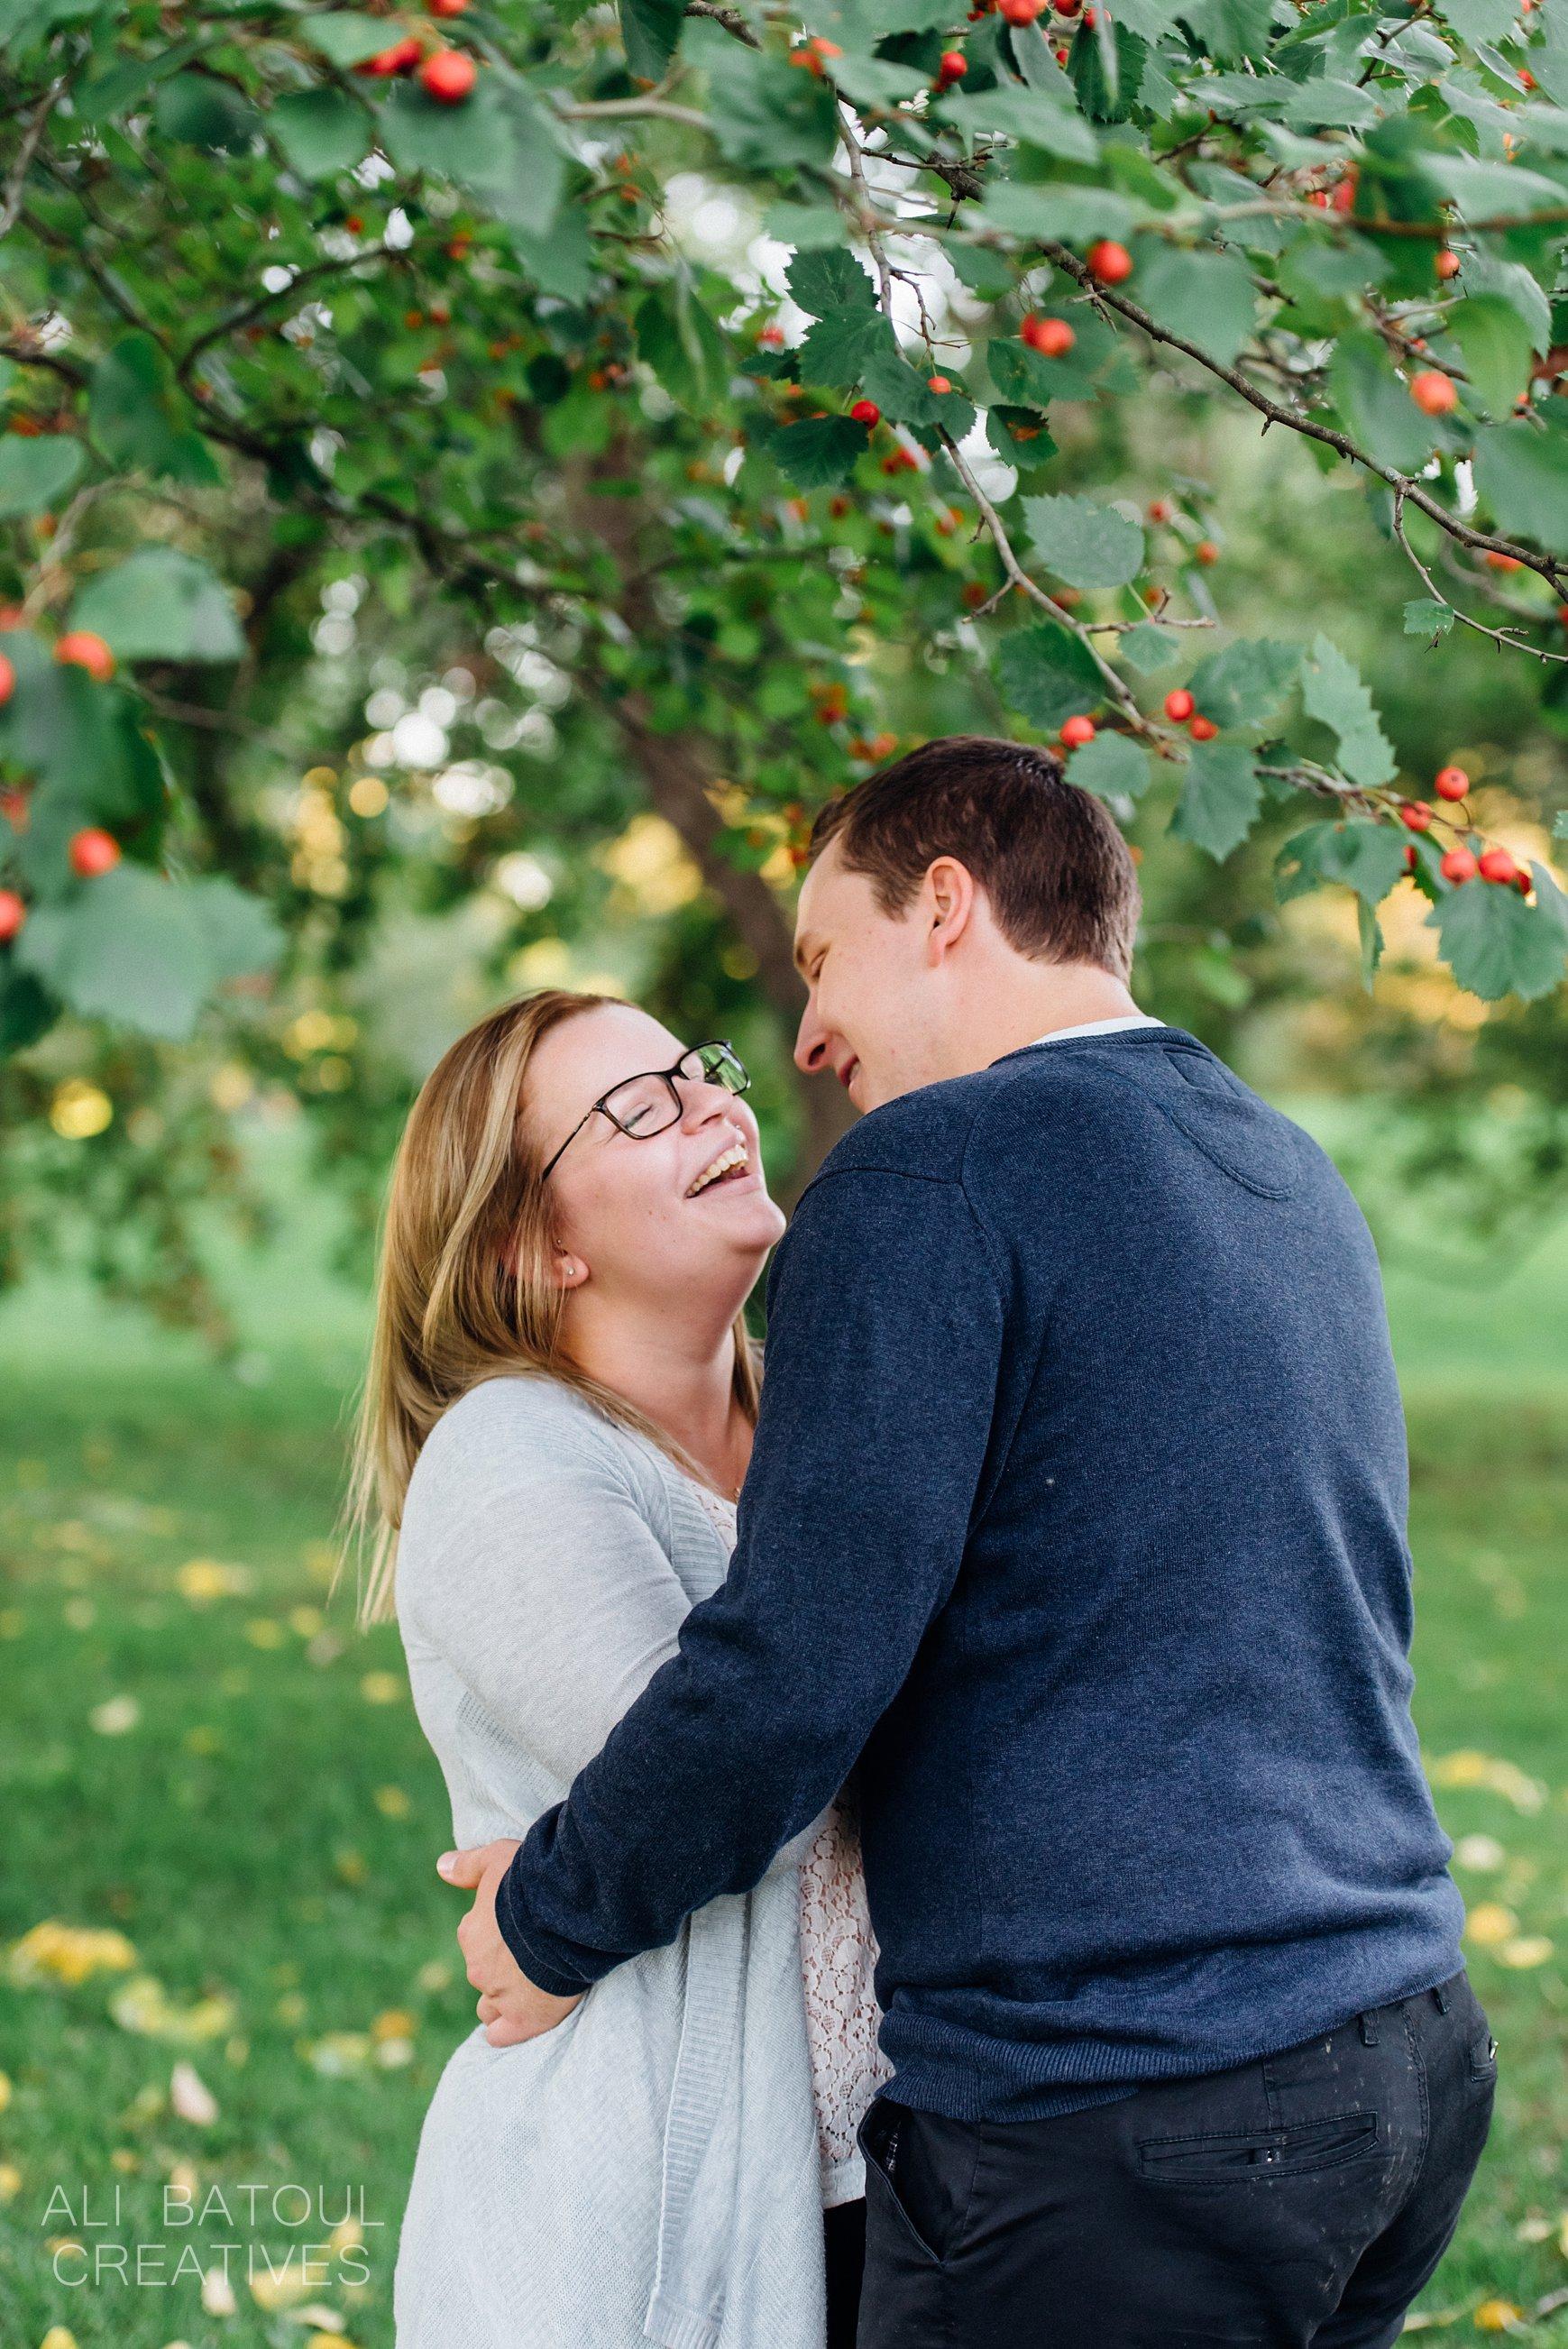 Natasha + Rich Ottawa Arboretum Engagement Photos - Ali and Batoul Fine Art Wedding Photography_0030.jpg